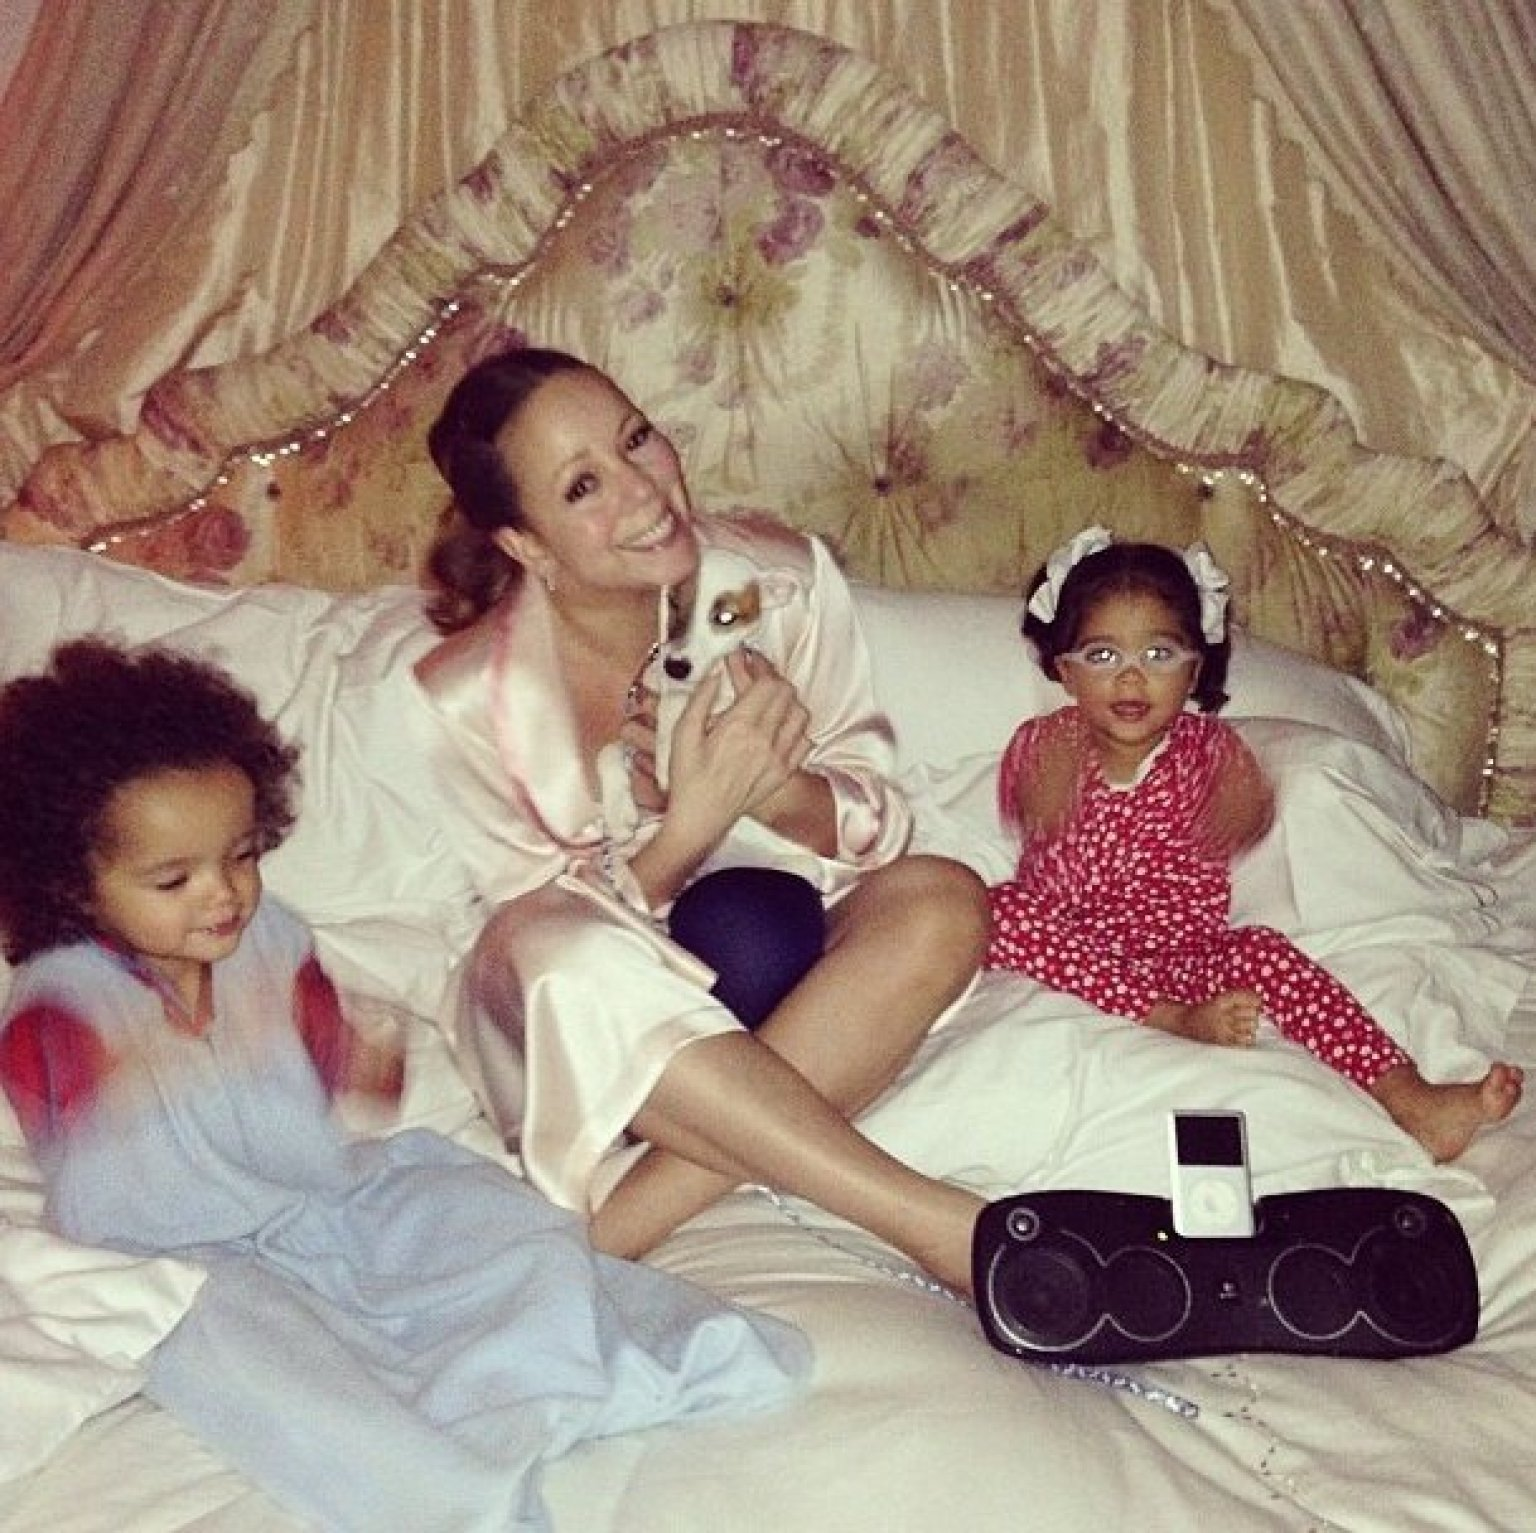 Mariah Carey, Twins Pose For Adorable Instagram Photo In ... Mariah Carey Instagram